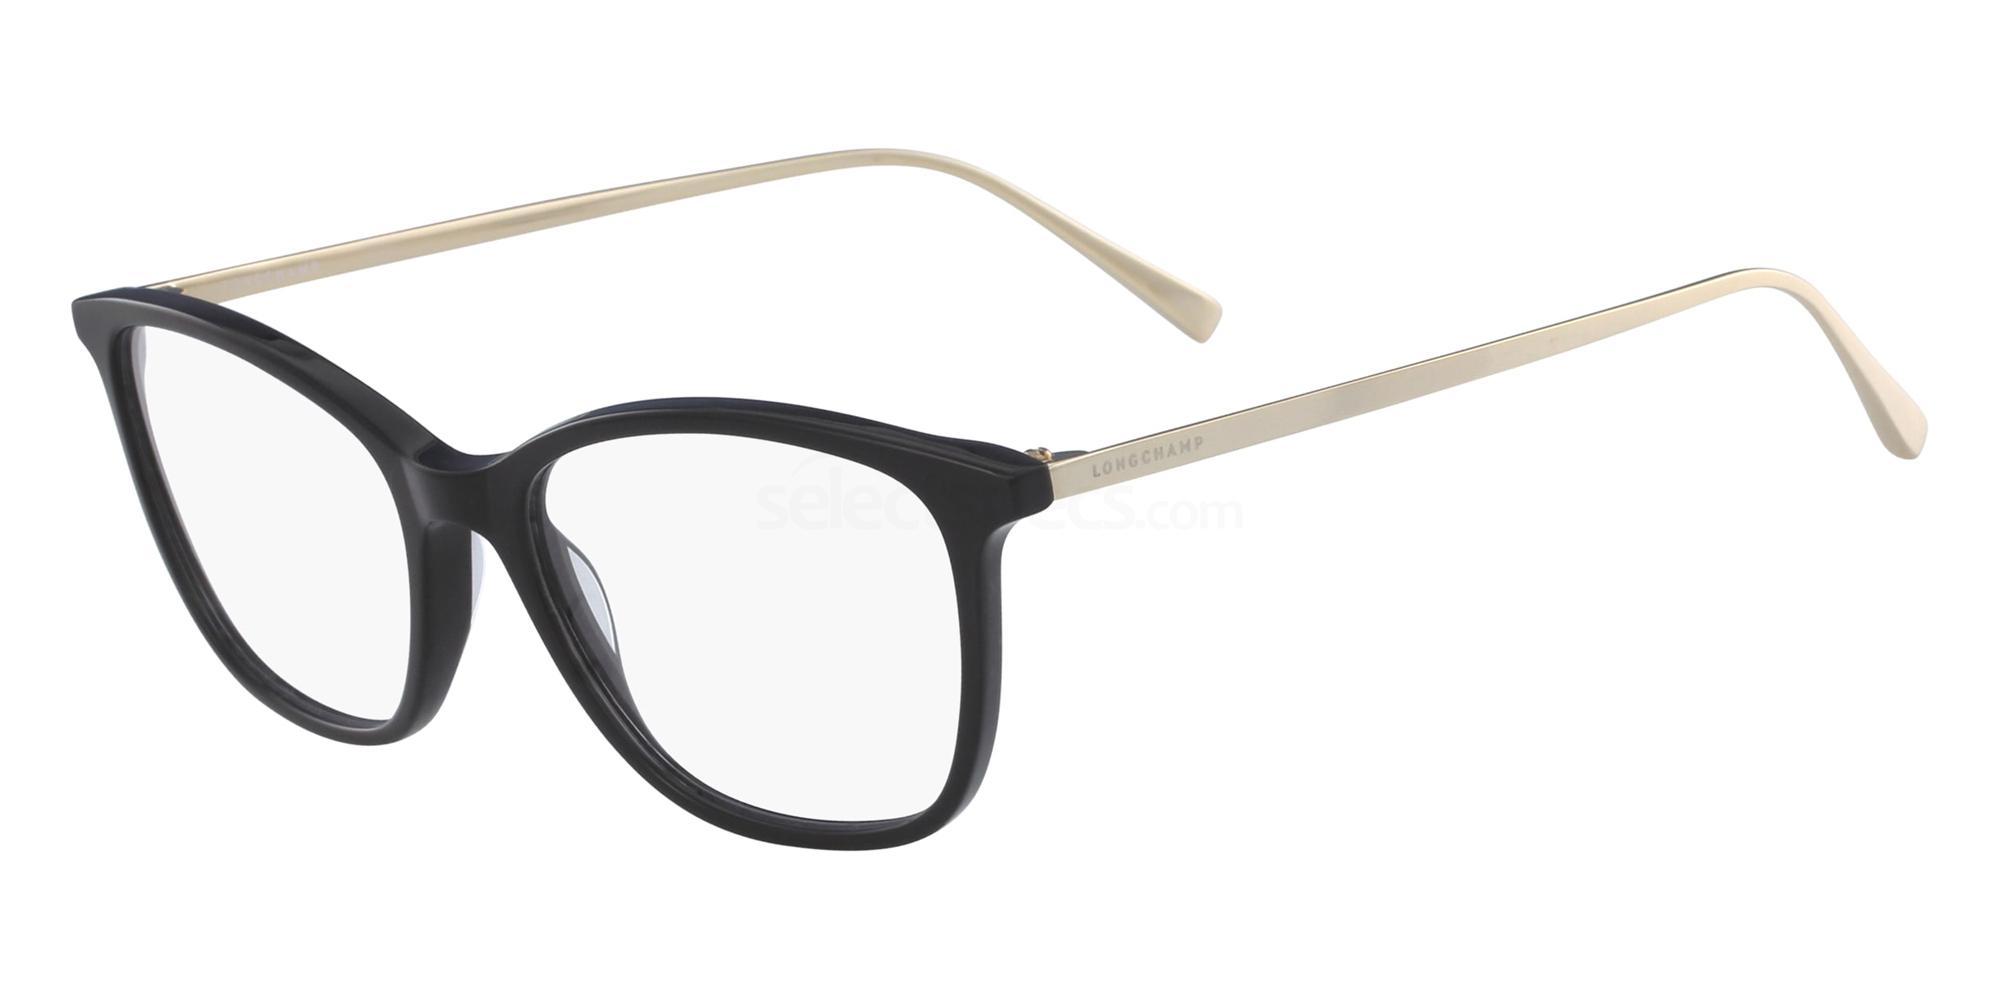 001 LO2606 Glasses, LONGCHAMP